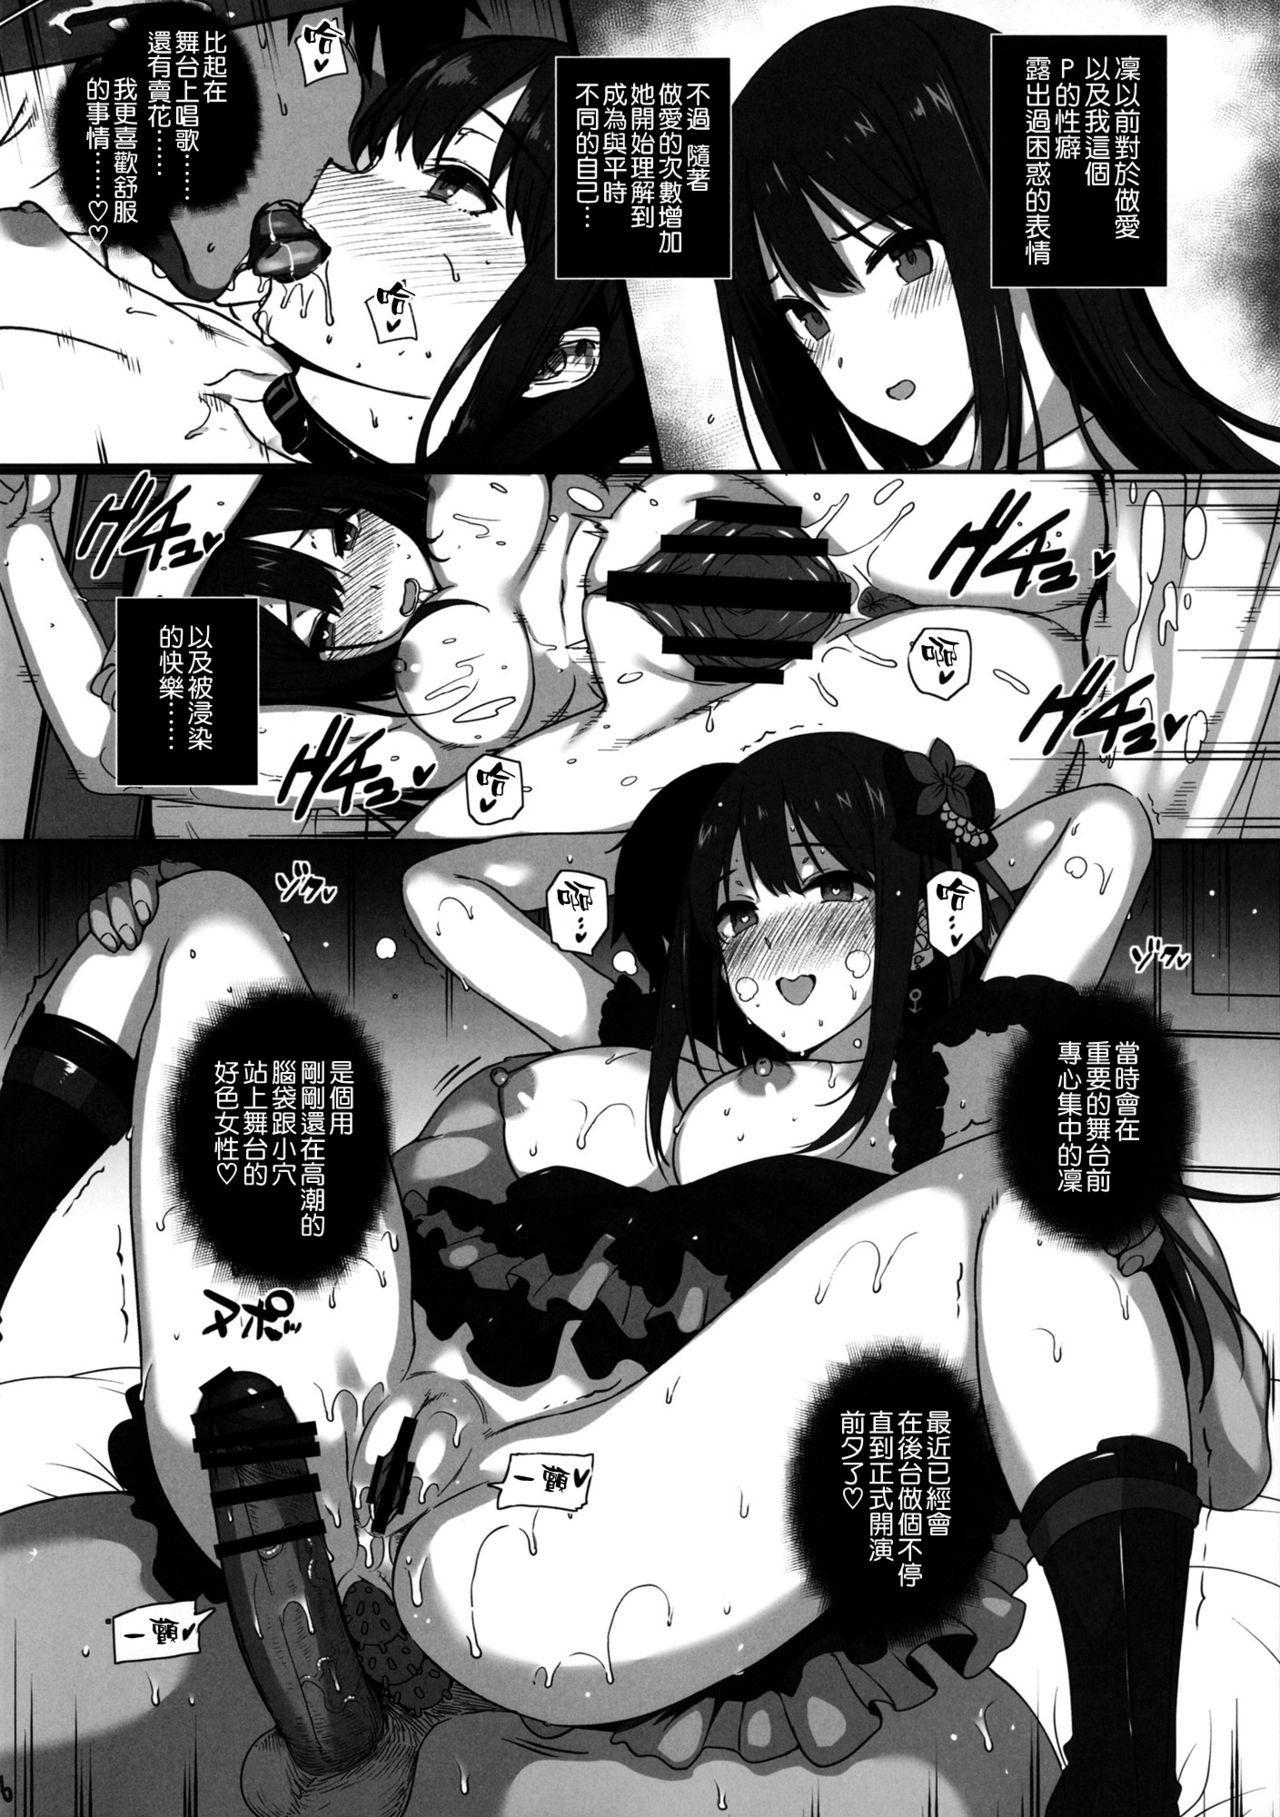 (C92) [Basutei Shower (Katsurai Yoshiaki)] Inran NUDIE TRIP ~sex harem 02~ + Omake Clear File (THE IDOLM@STER CINDERELLA GIRLS) [Chinese] [空気系☆漢化] 17